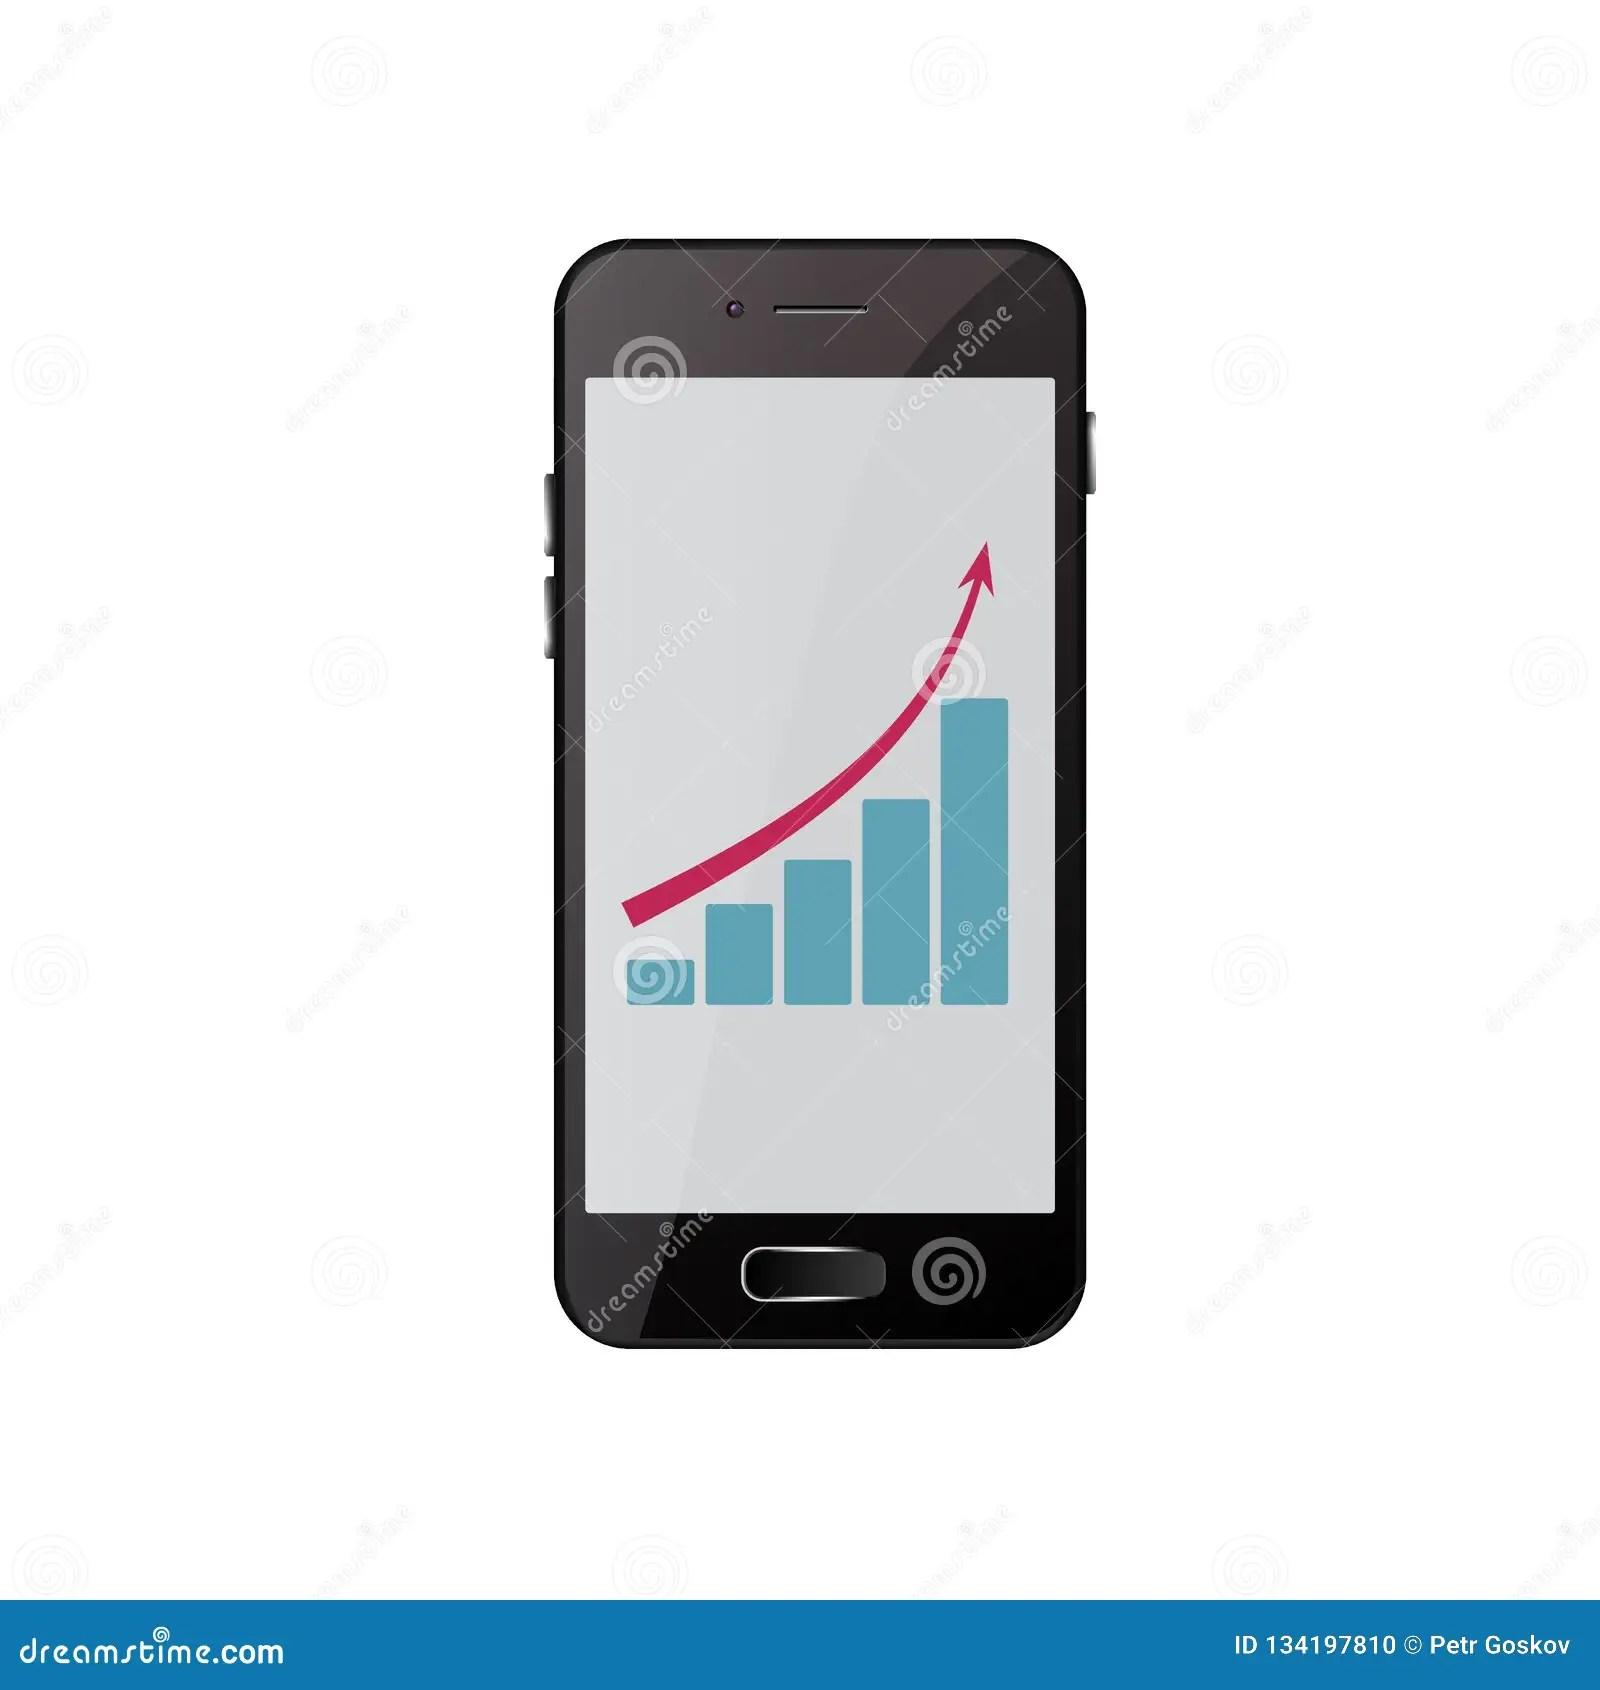 Vertical Bar Graph Stock Vector Illustration Of Mobile